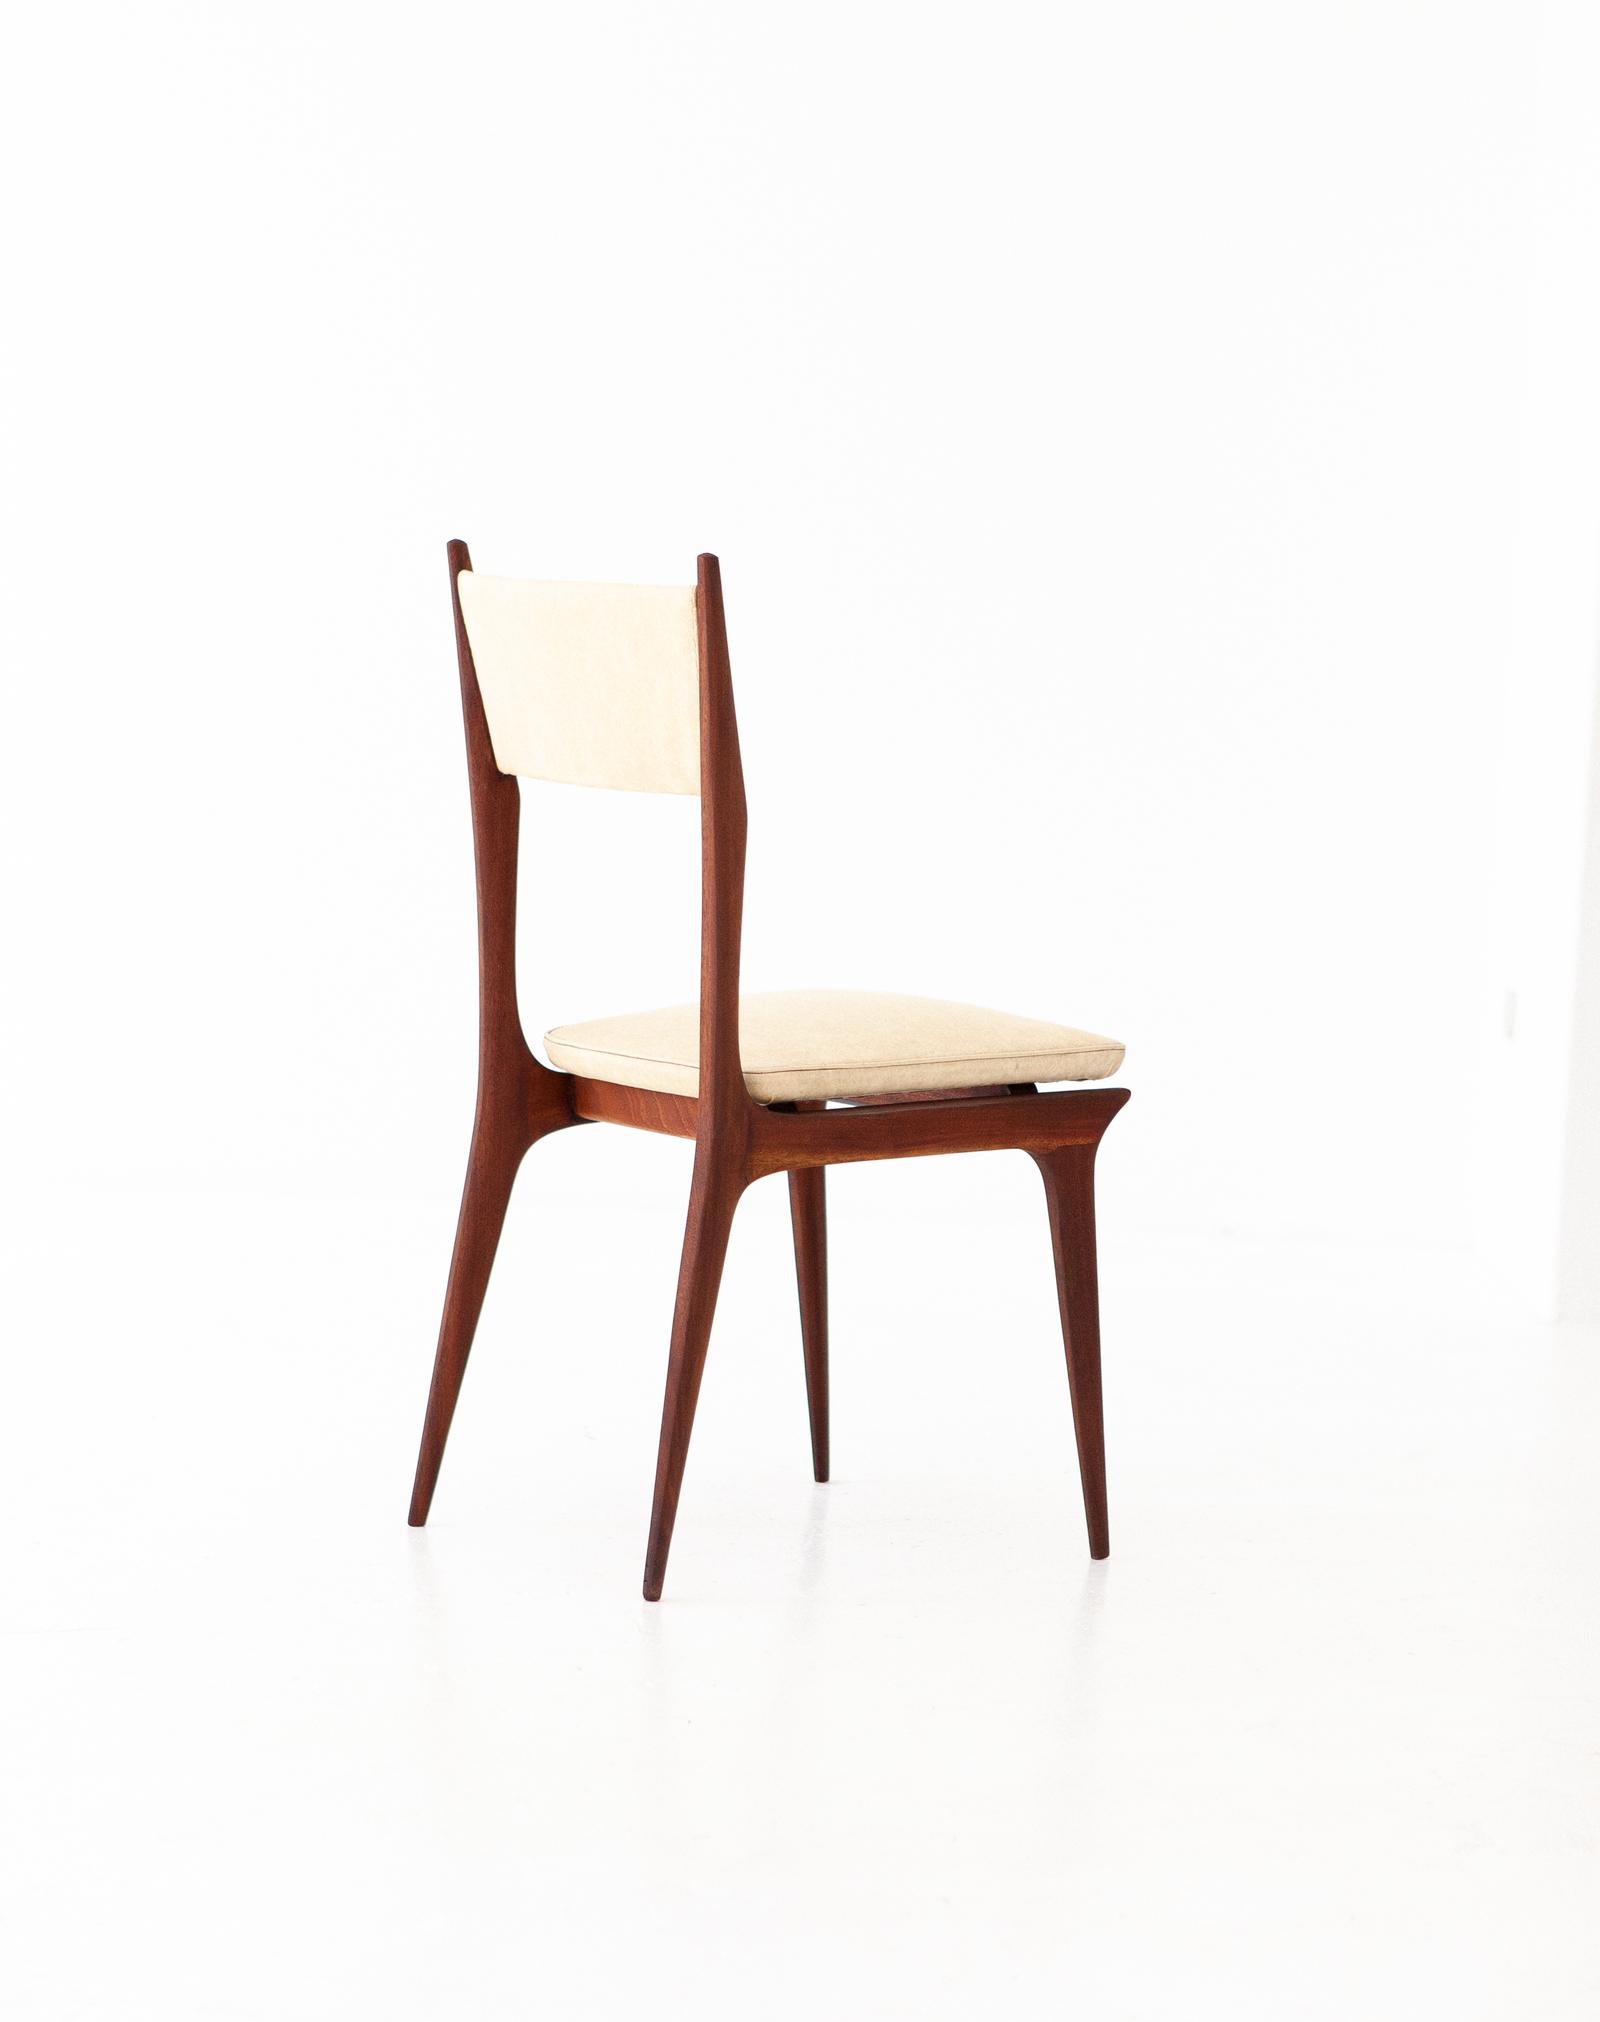 six-italian-mahogany-beige-skai-dining-chairs-5-SE281